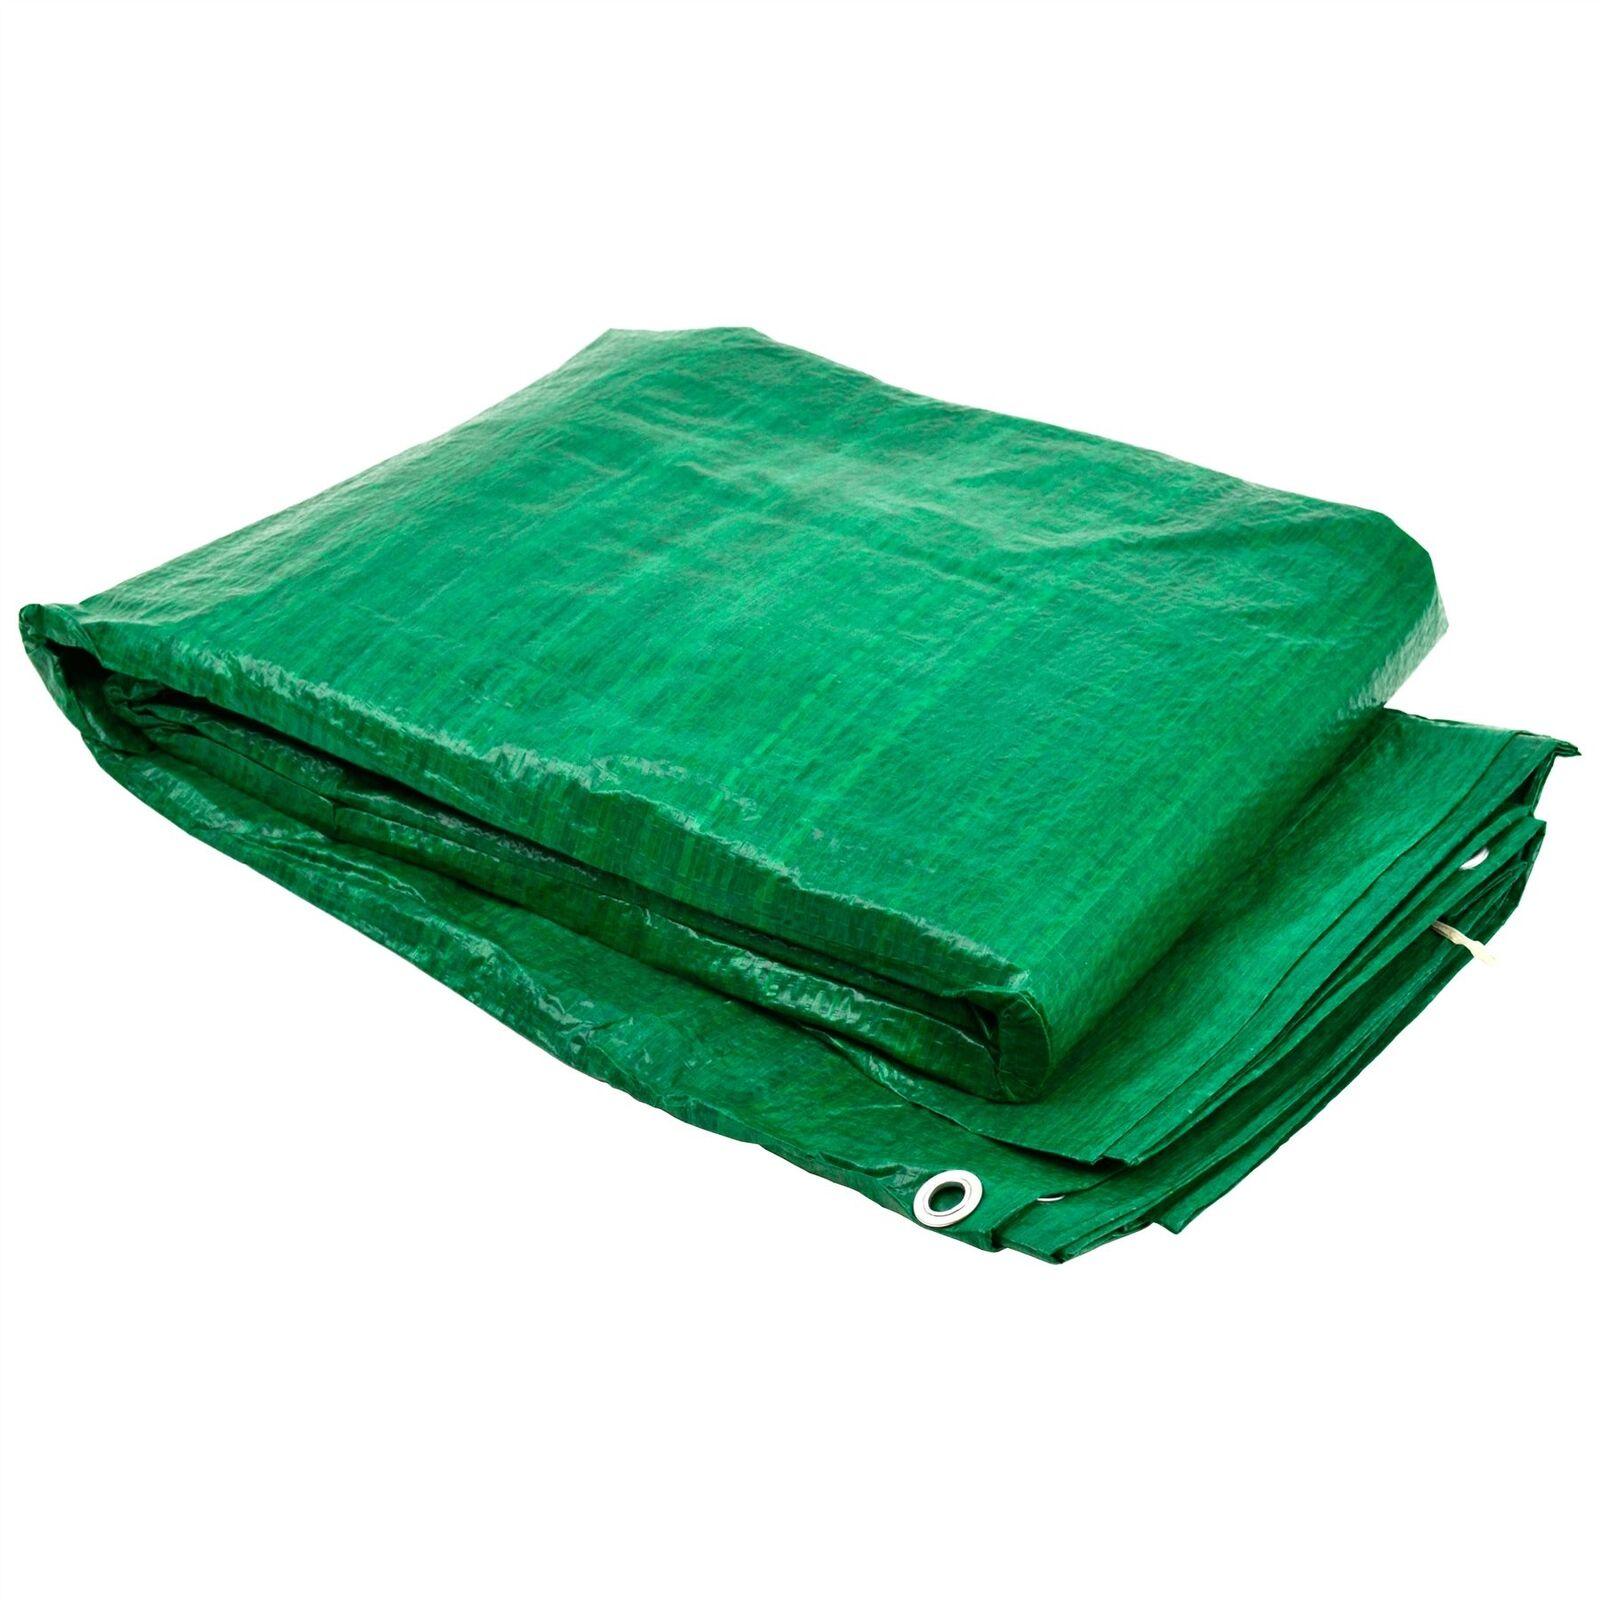 Tarpaulin Sheet Tarp Cover Ground Sheet Waterproof 7m x 9m   23ft x 30ft TE777